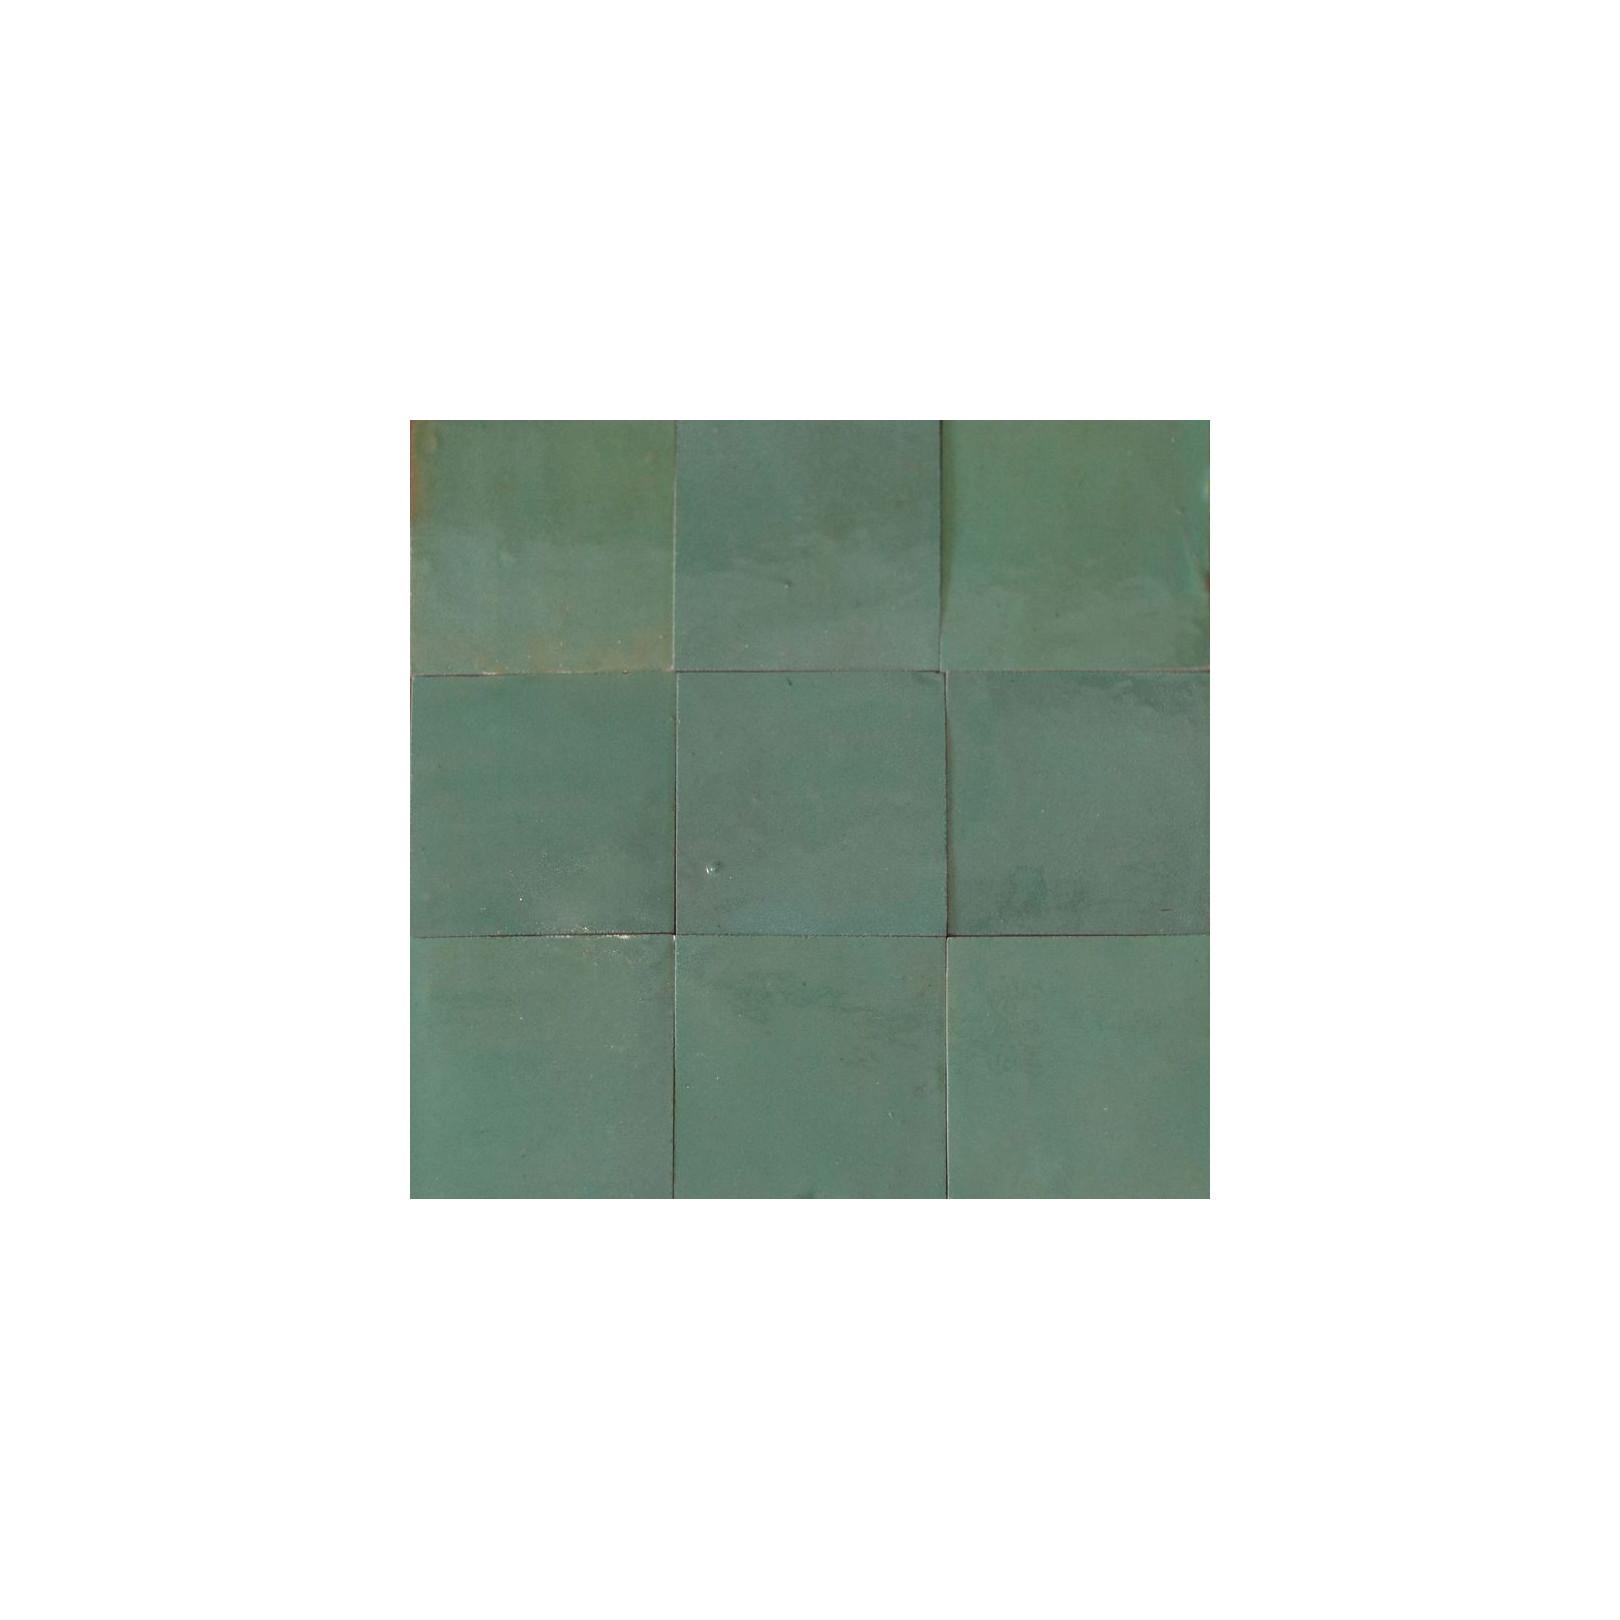 Carrelage mural Zellige manuel Vert d\'eau 15 - CasaLux Home Design